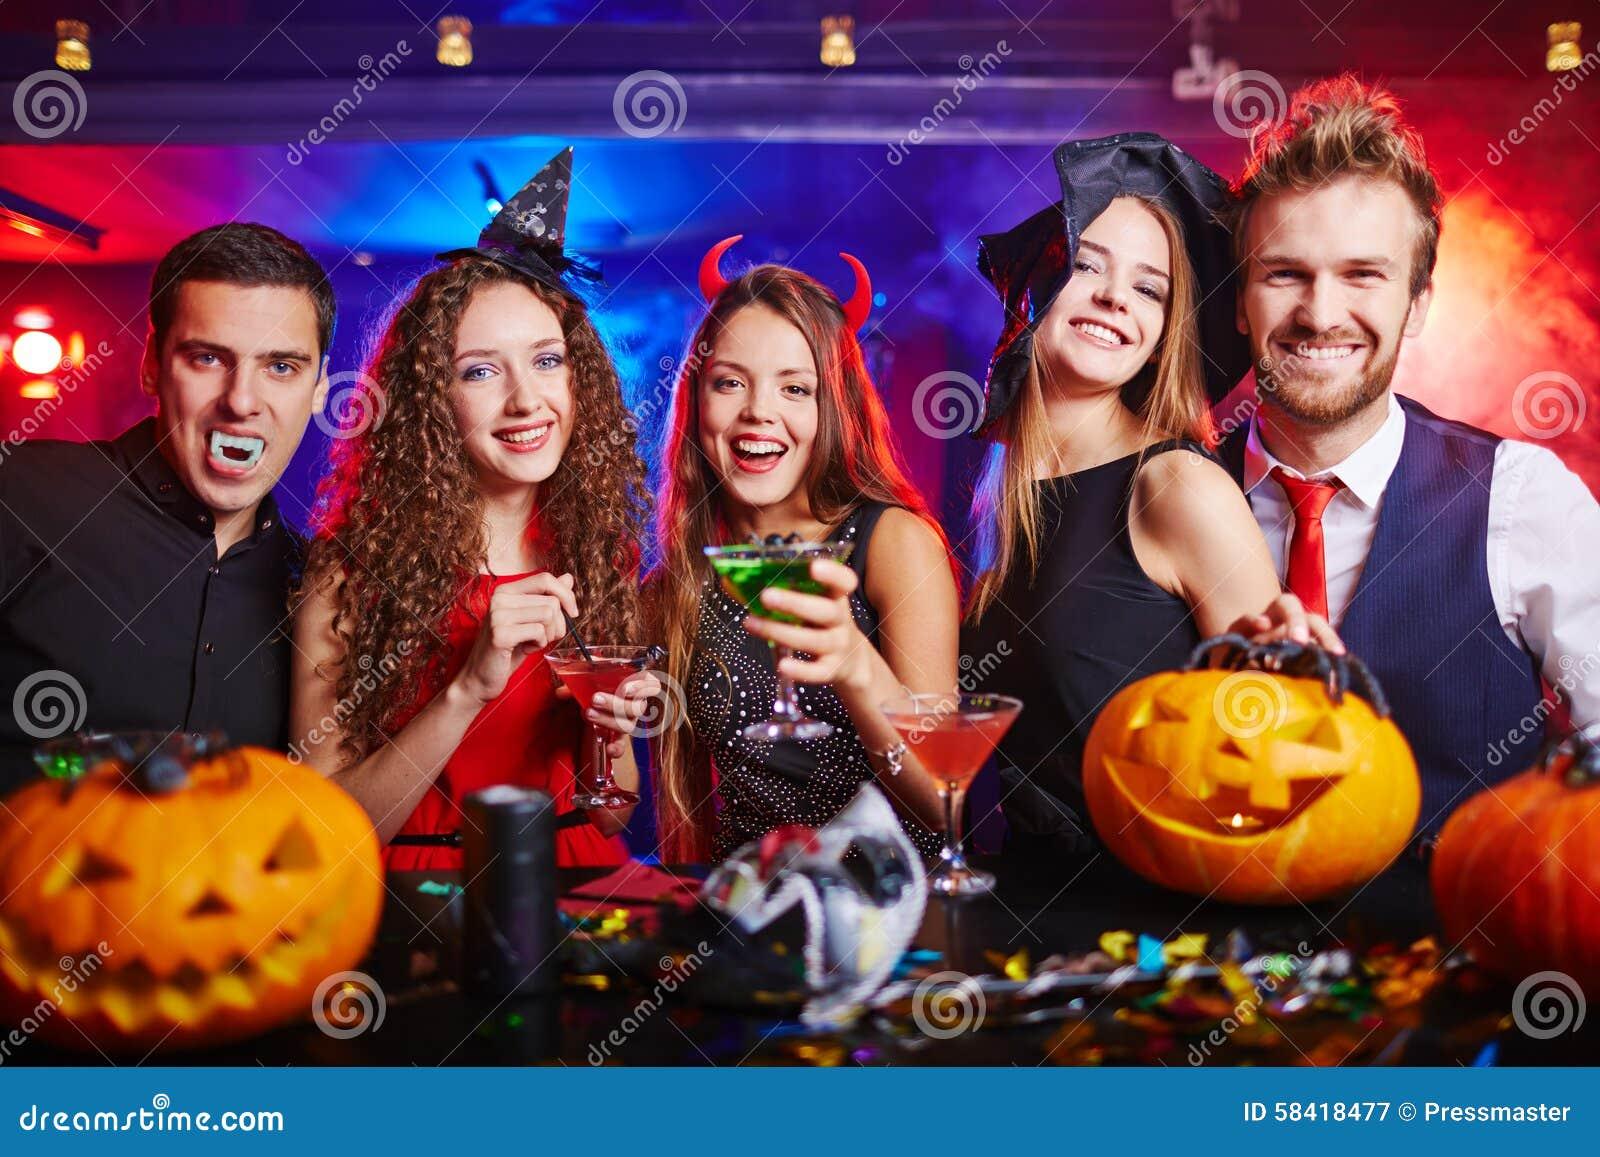 Фото из ночных клубов с хэллоуина работа в стрип клубе краснодар